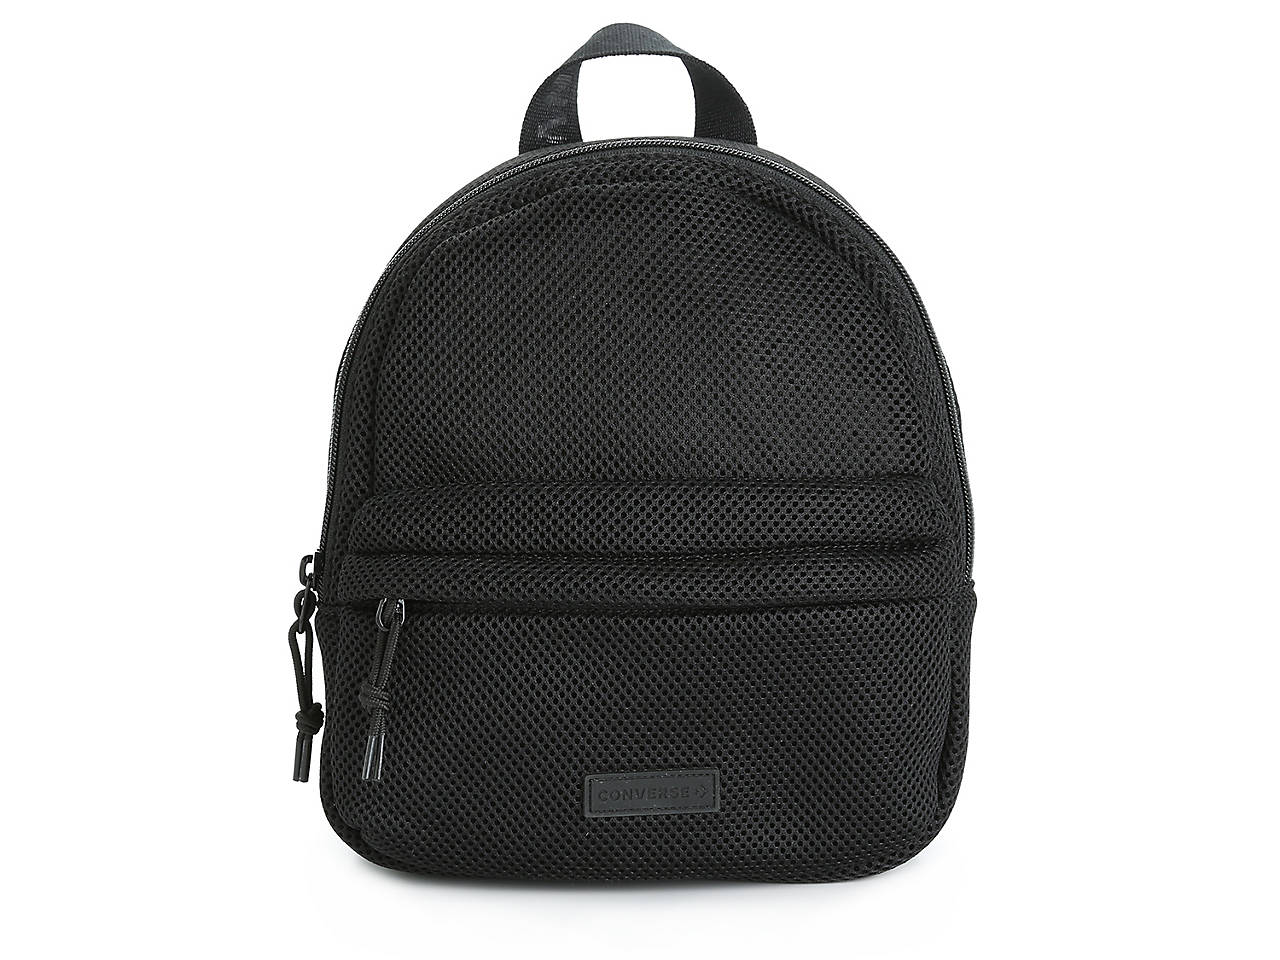 Converse As If Mini Backpack Women s Handbags   Accessories  de45f29ce572d